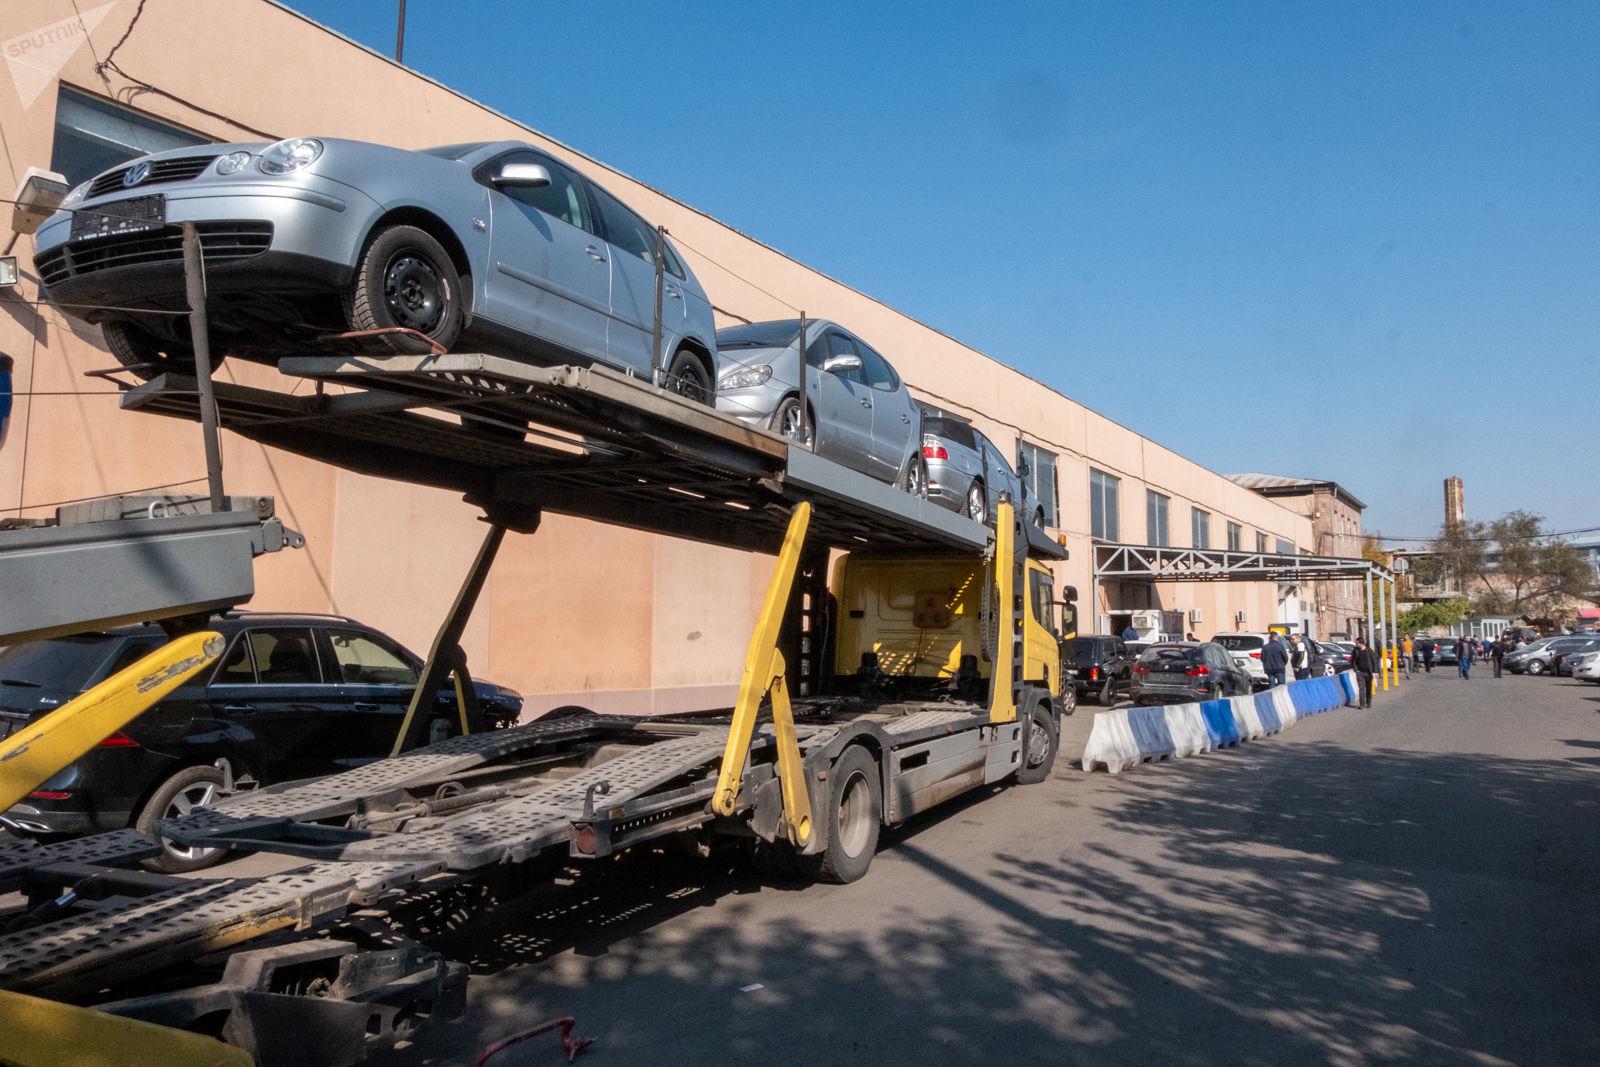 EAEU, customs clearance, customs, Yerevan, Gyumri, old cars, duties,